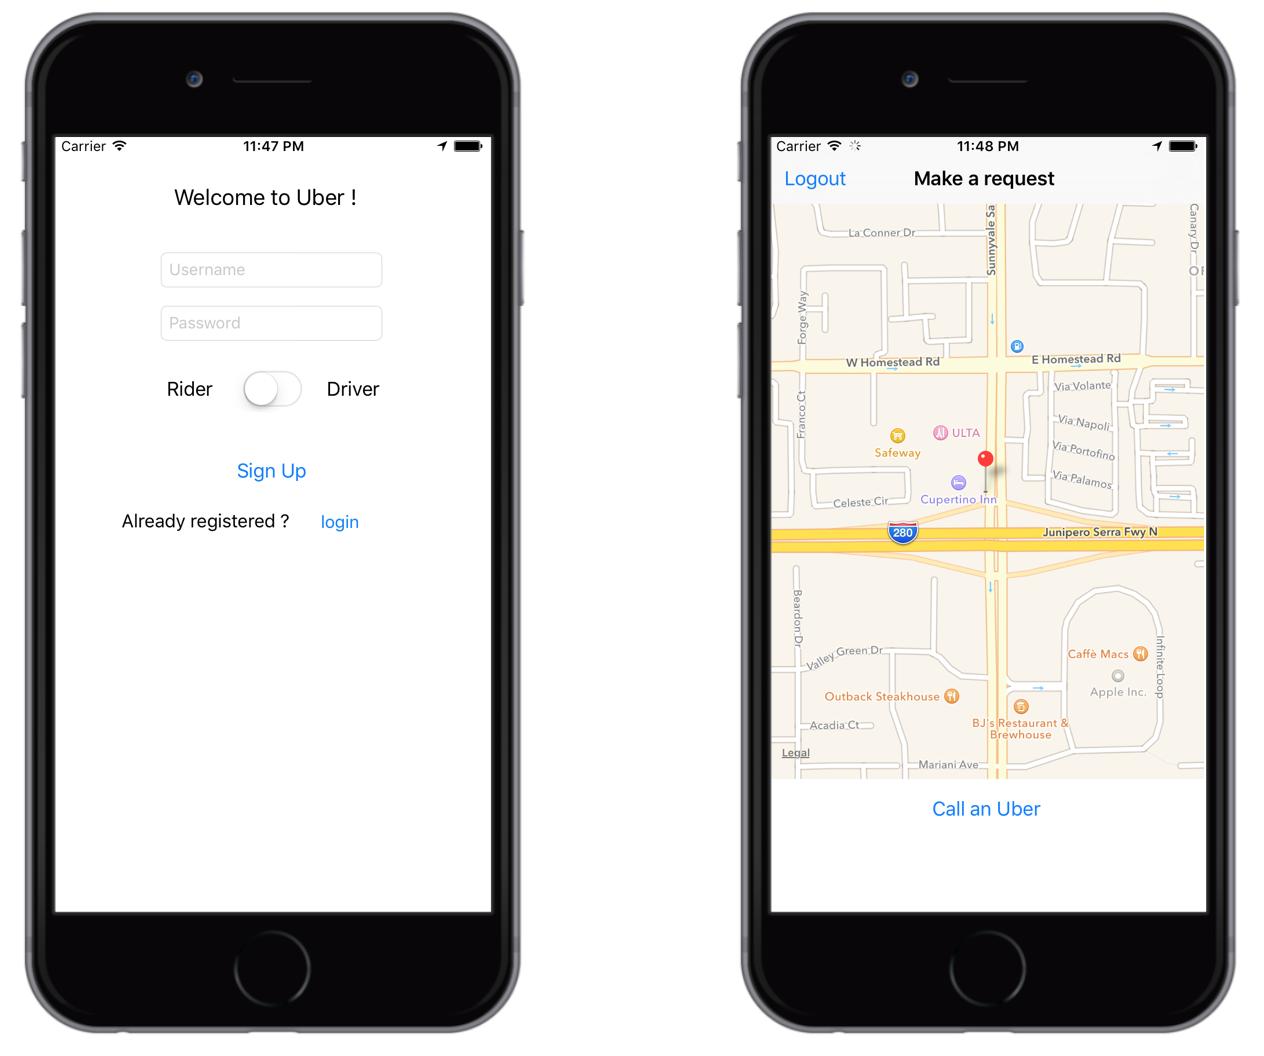 GitHub - RedFish/Uber: Uber iOS Application Clone